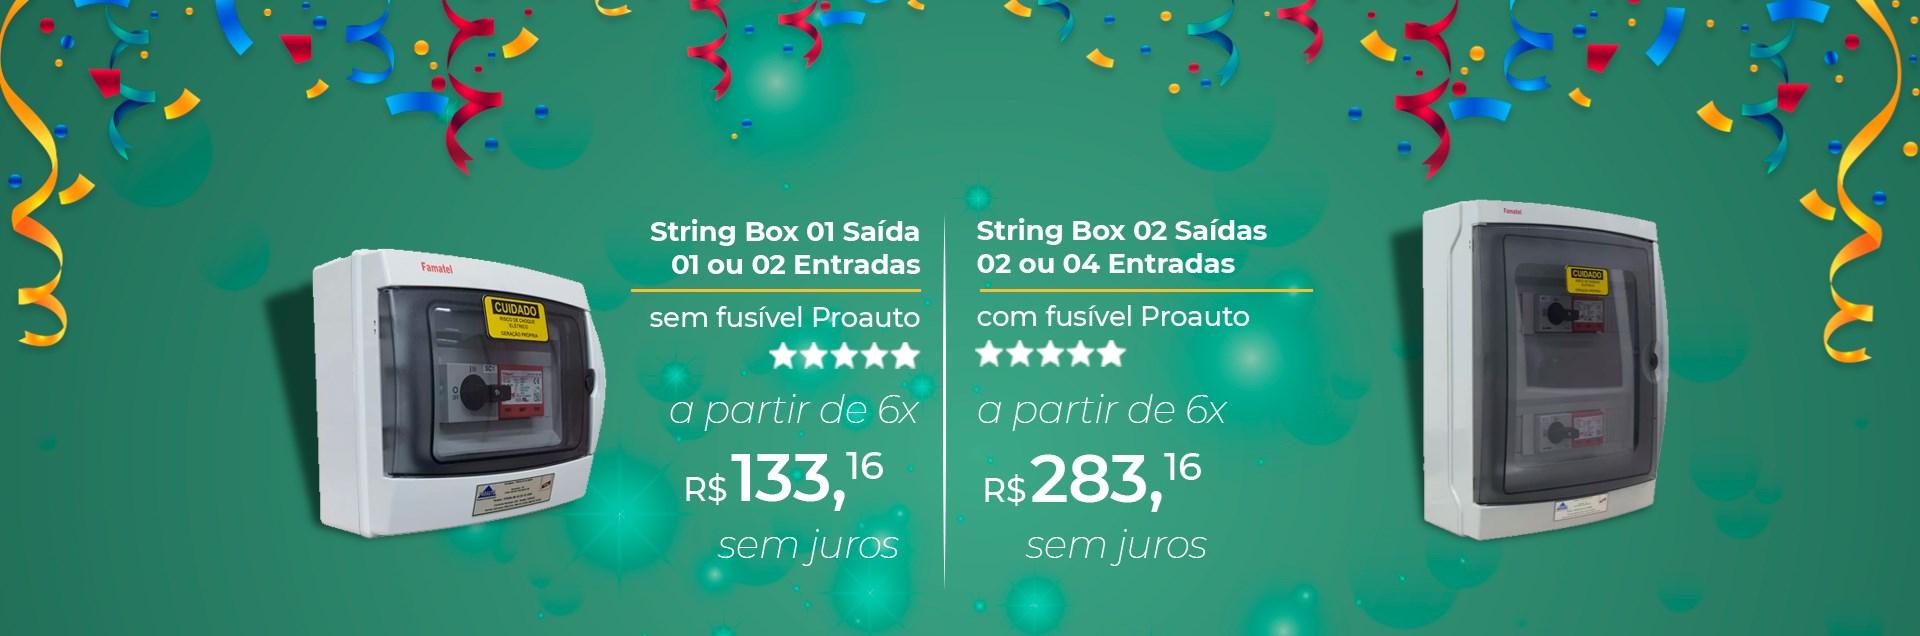 Carnaval 2019 - String Box